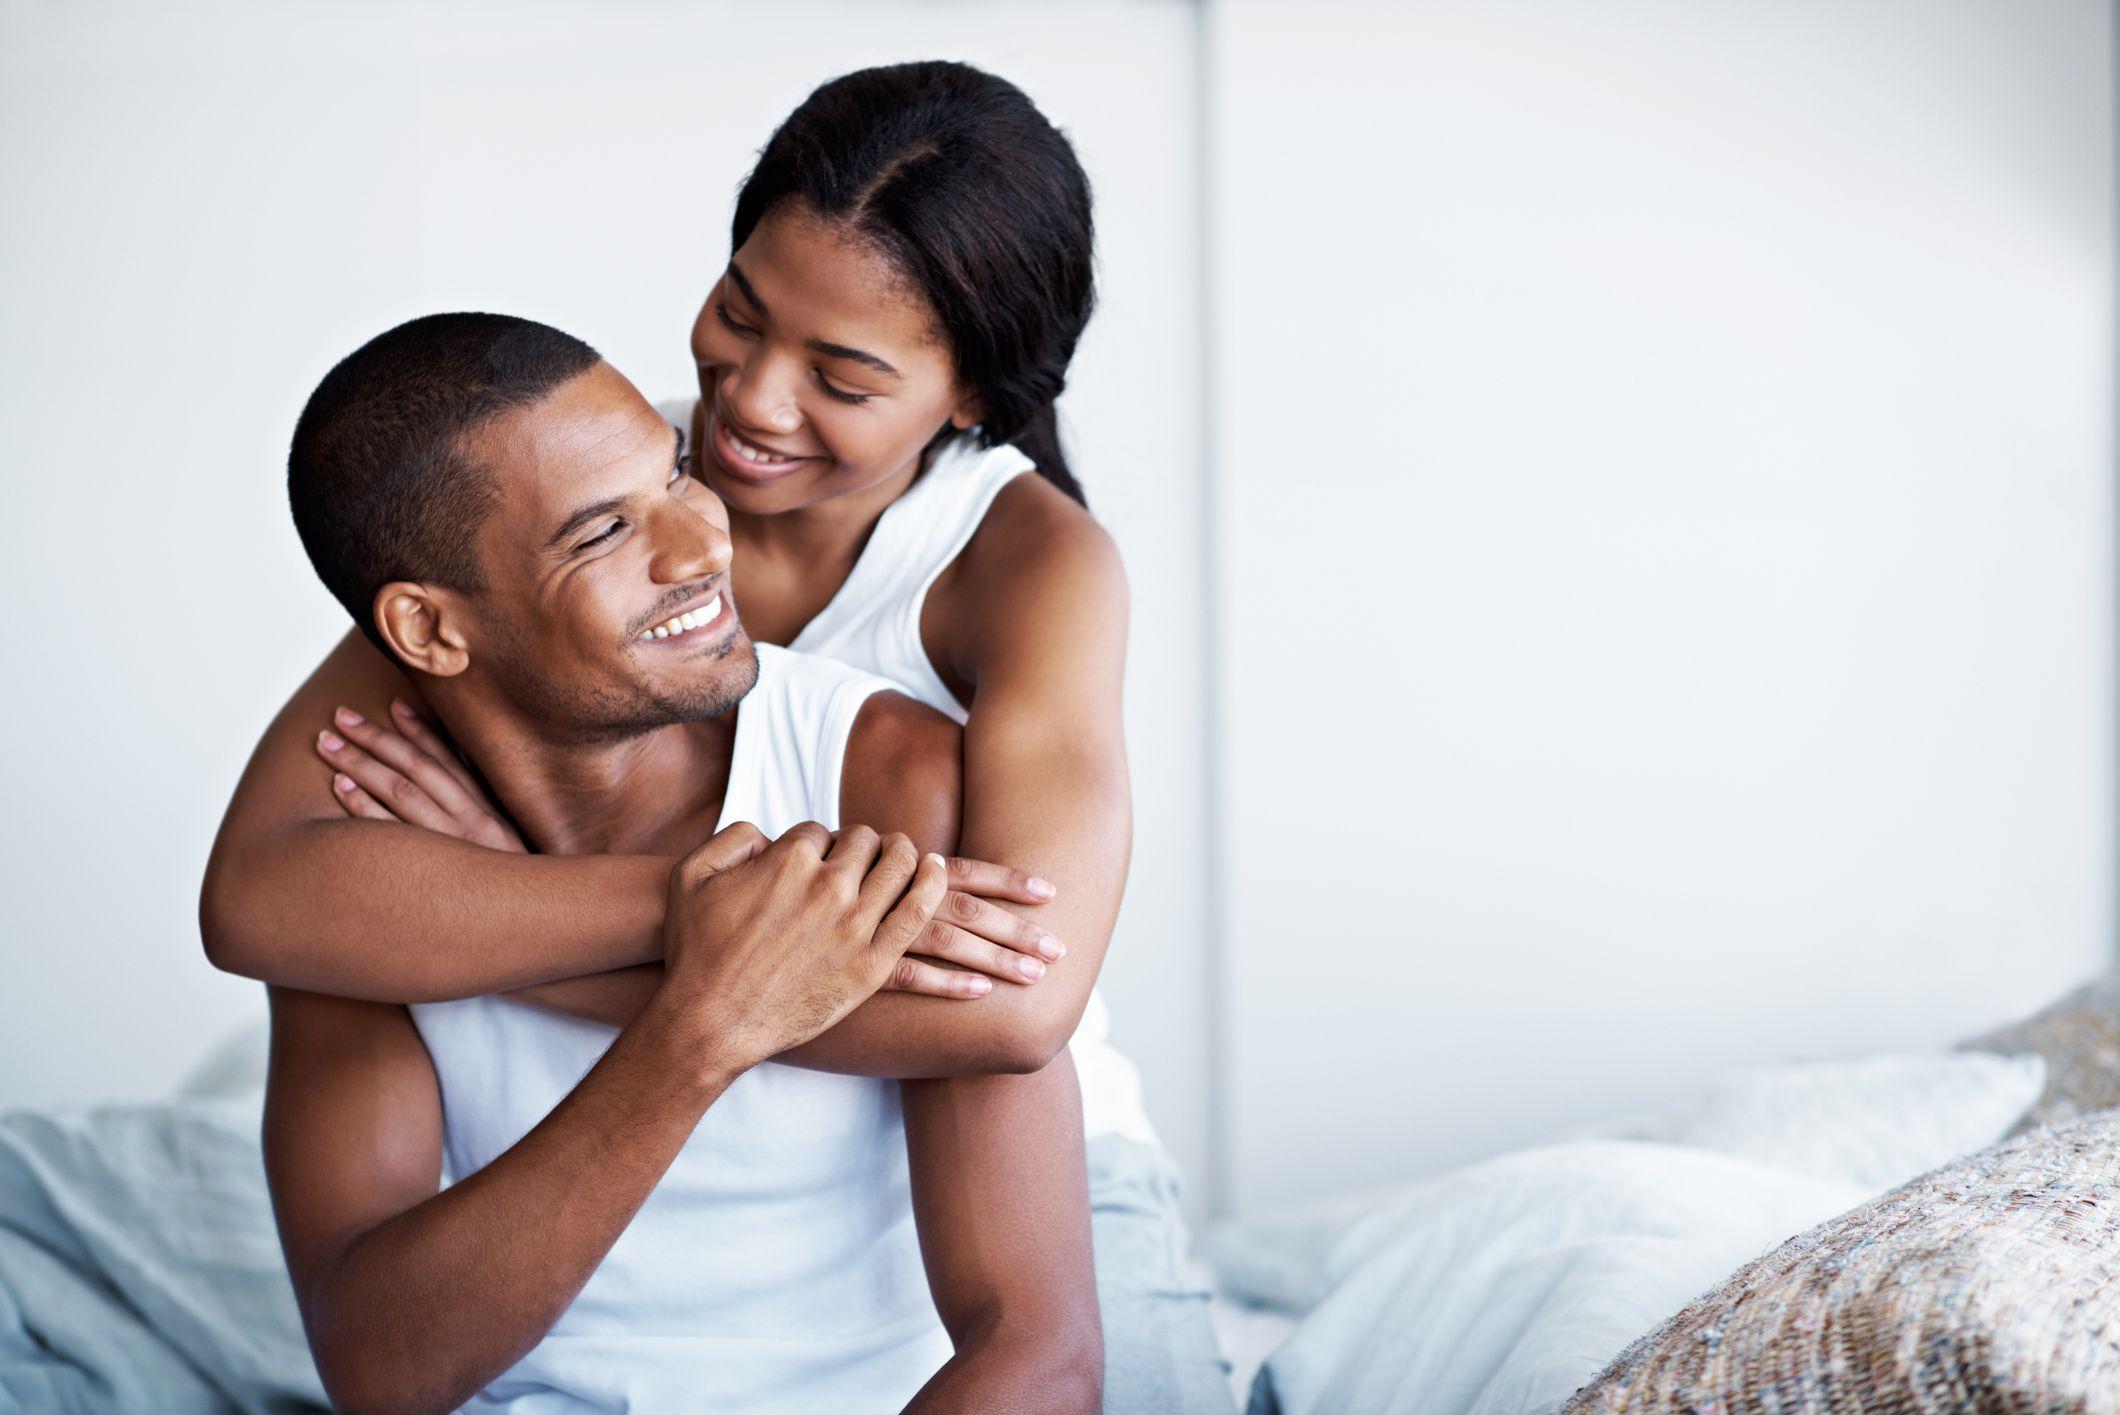 Uk collges sex hot videos free